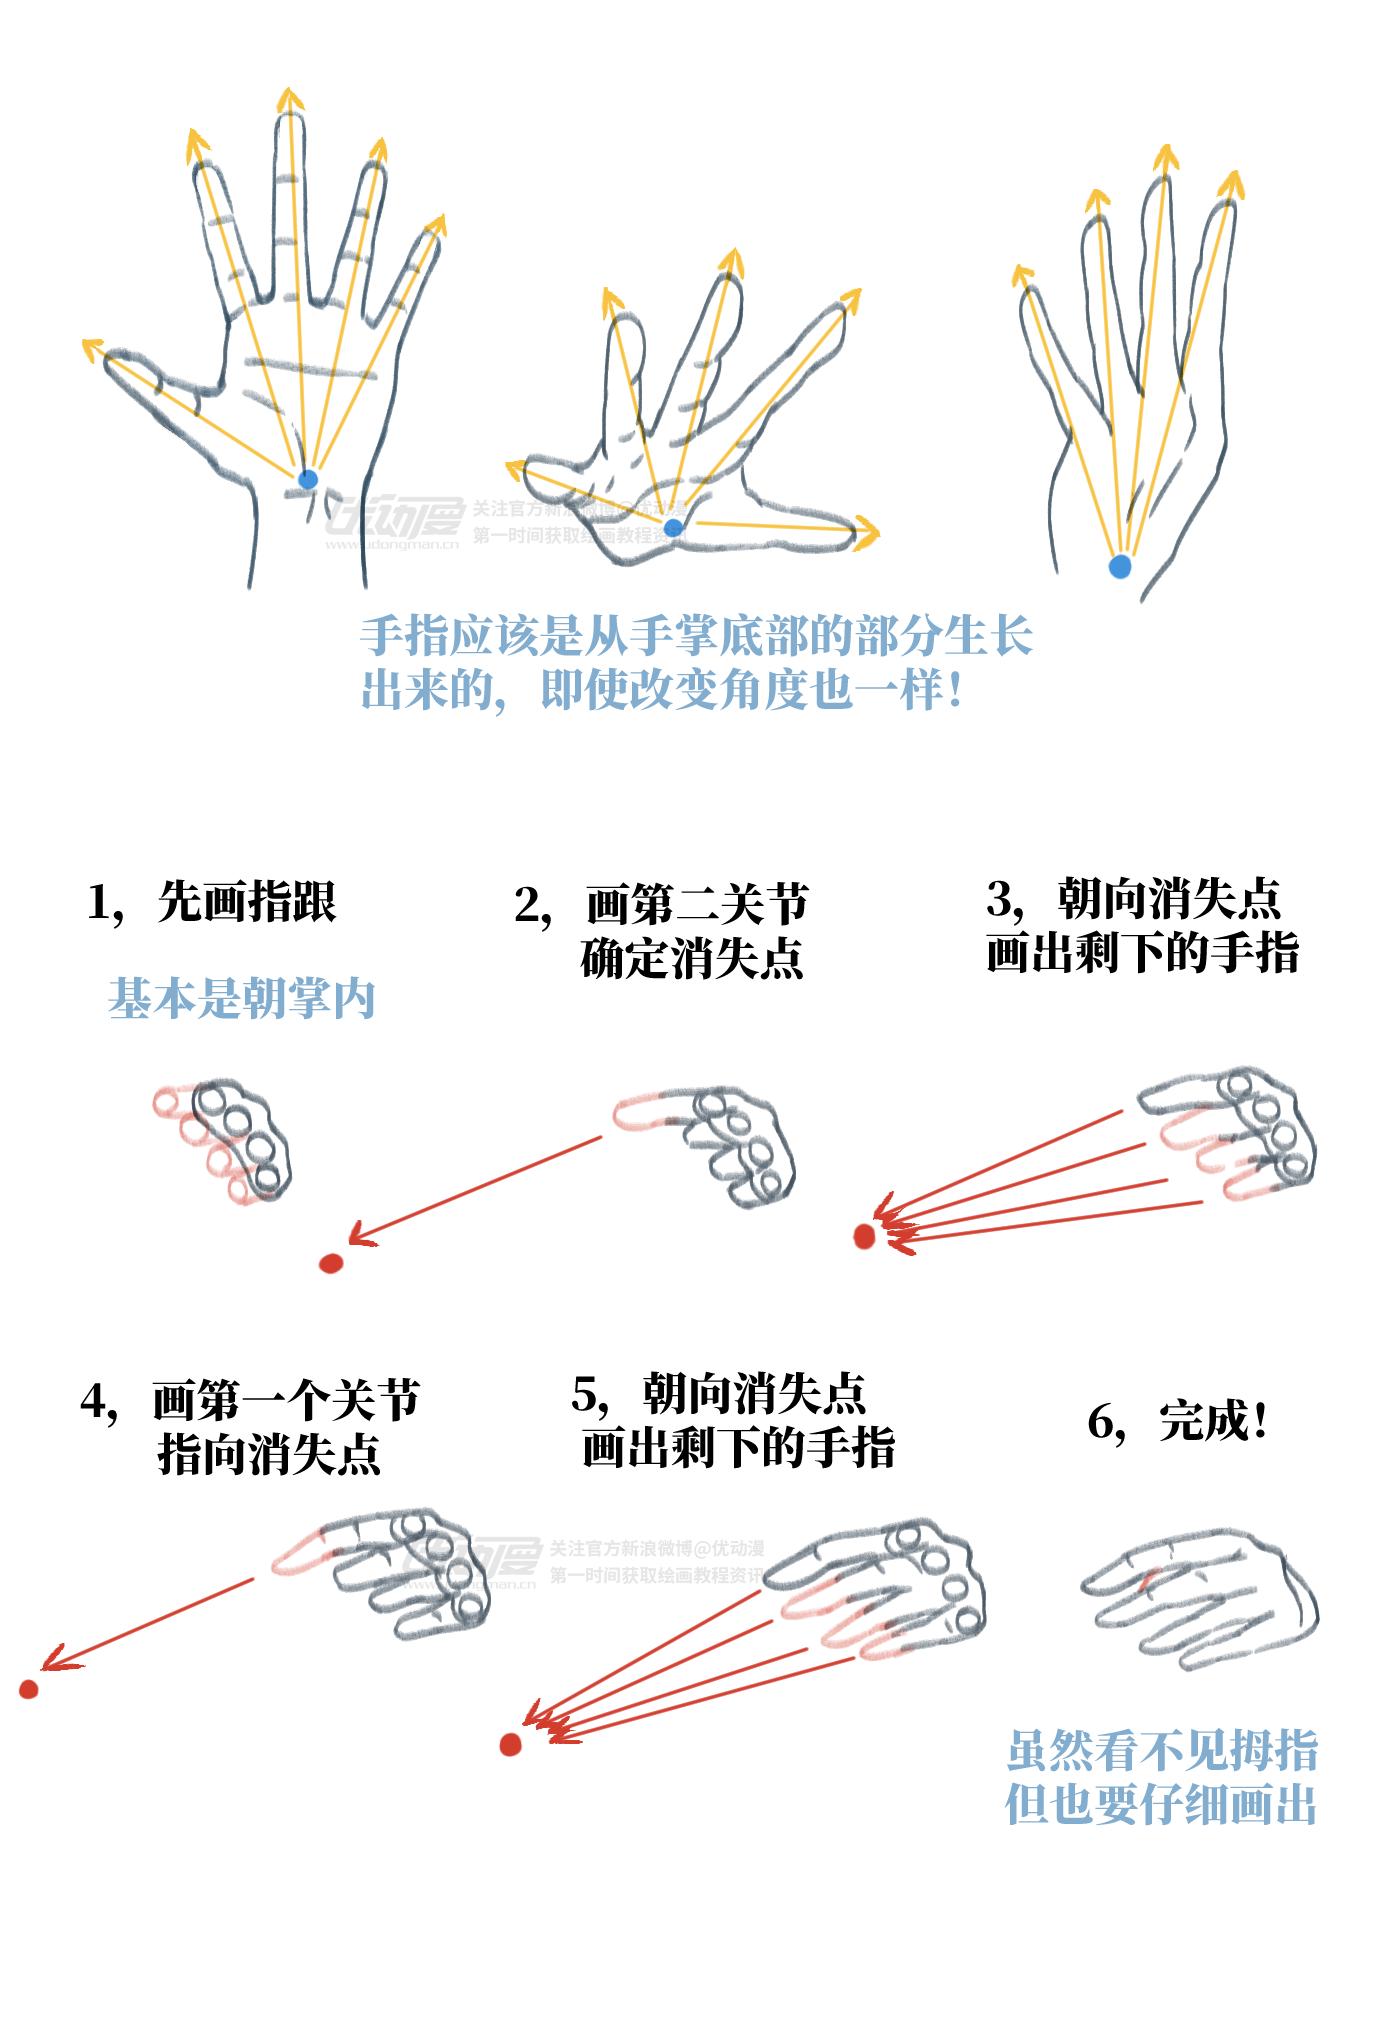 手的基础画法3.png